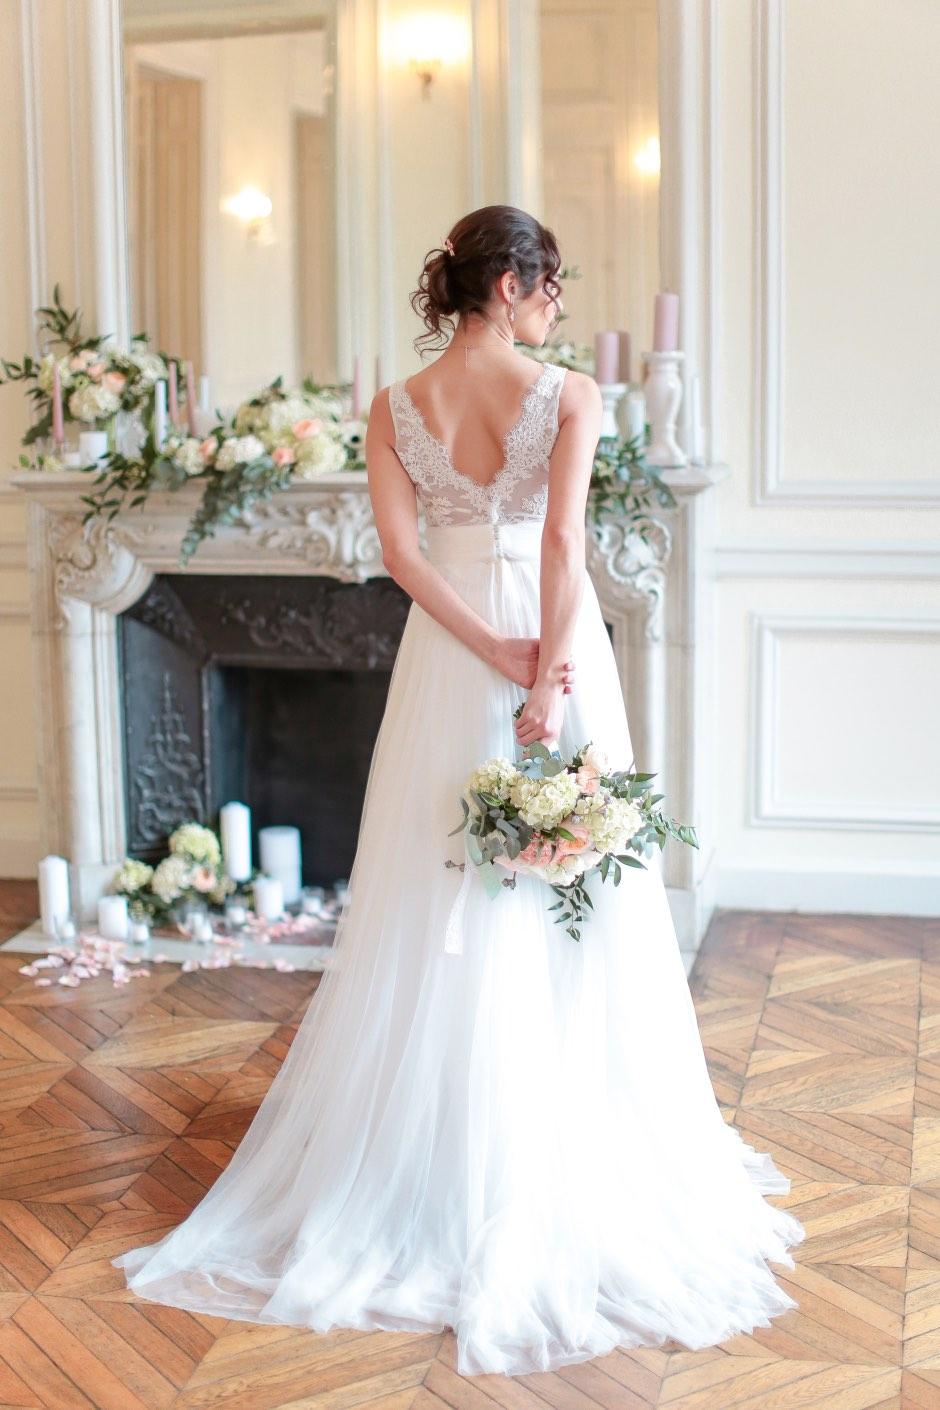 Mariage-rose-gold-mariée